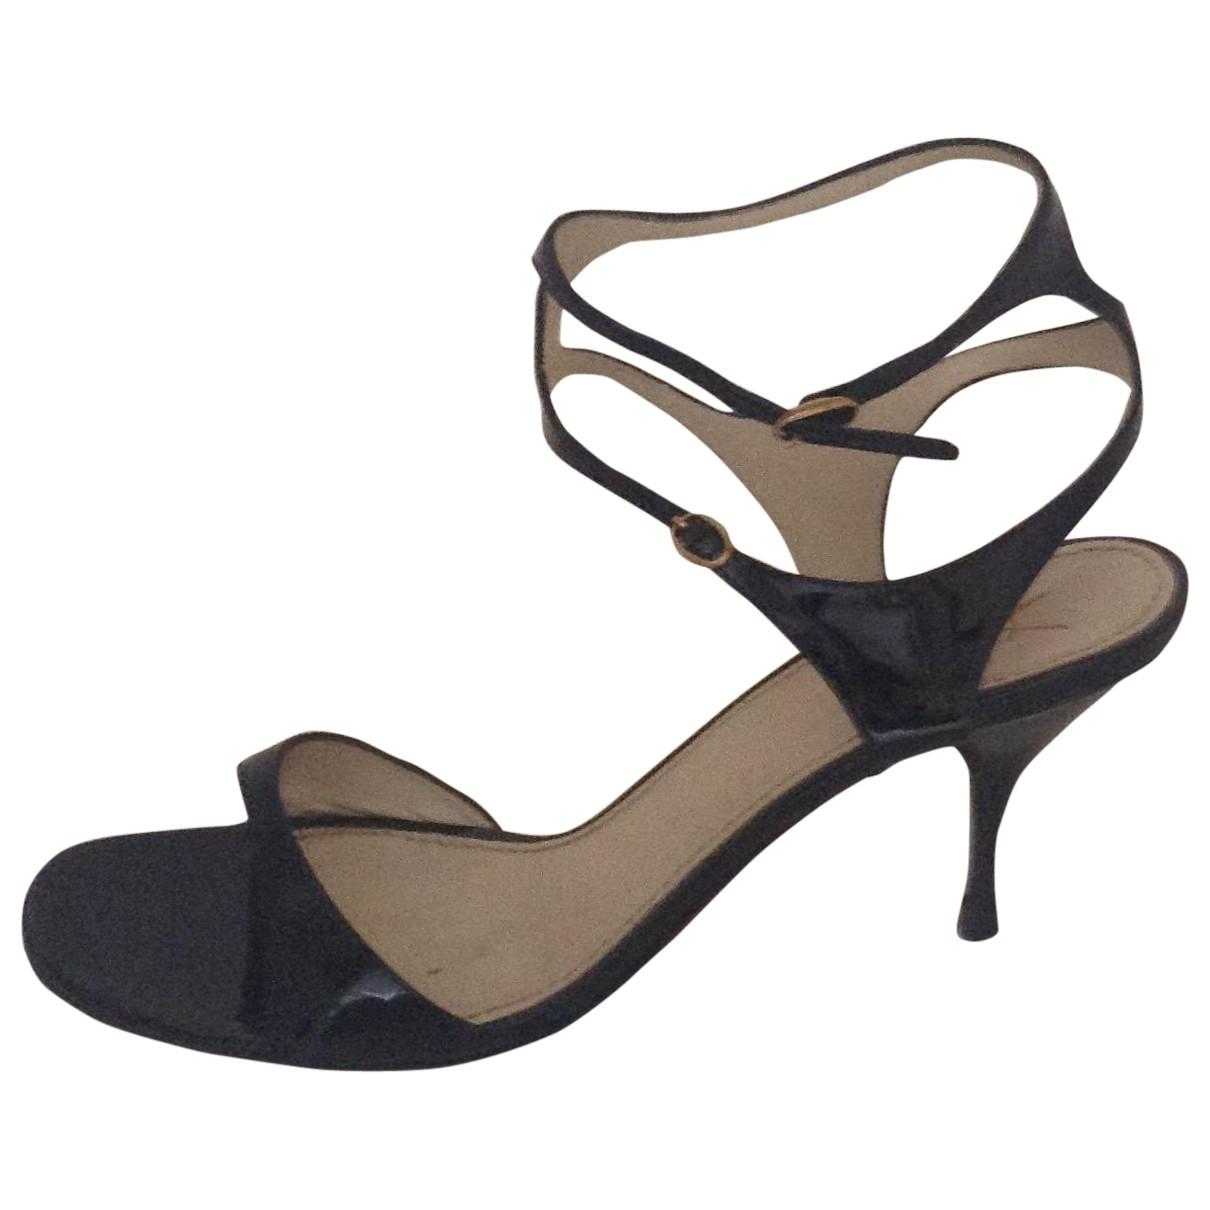 Yves Saint Laurent \N Black Patent leather Sandals for Women 39.5 EU